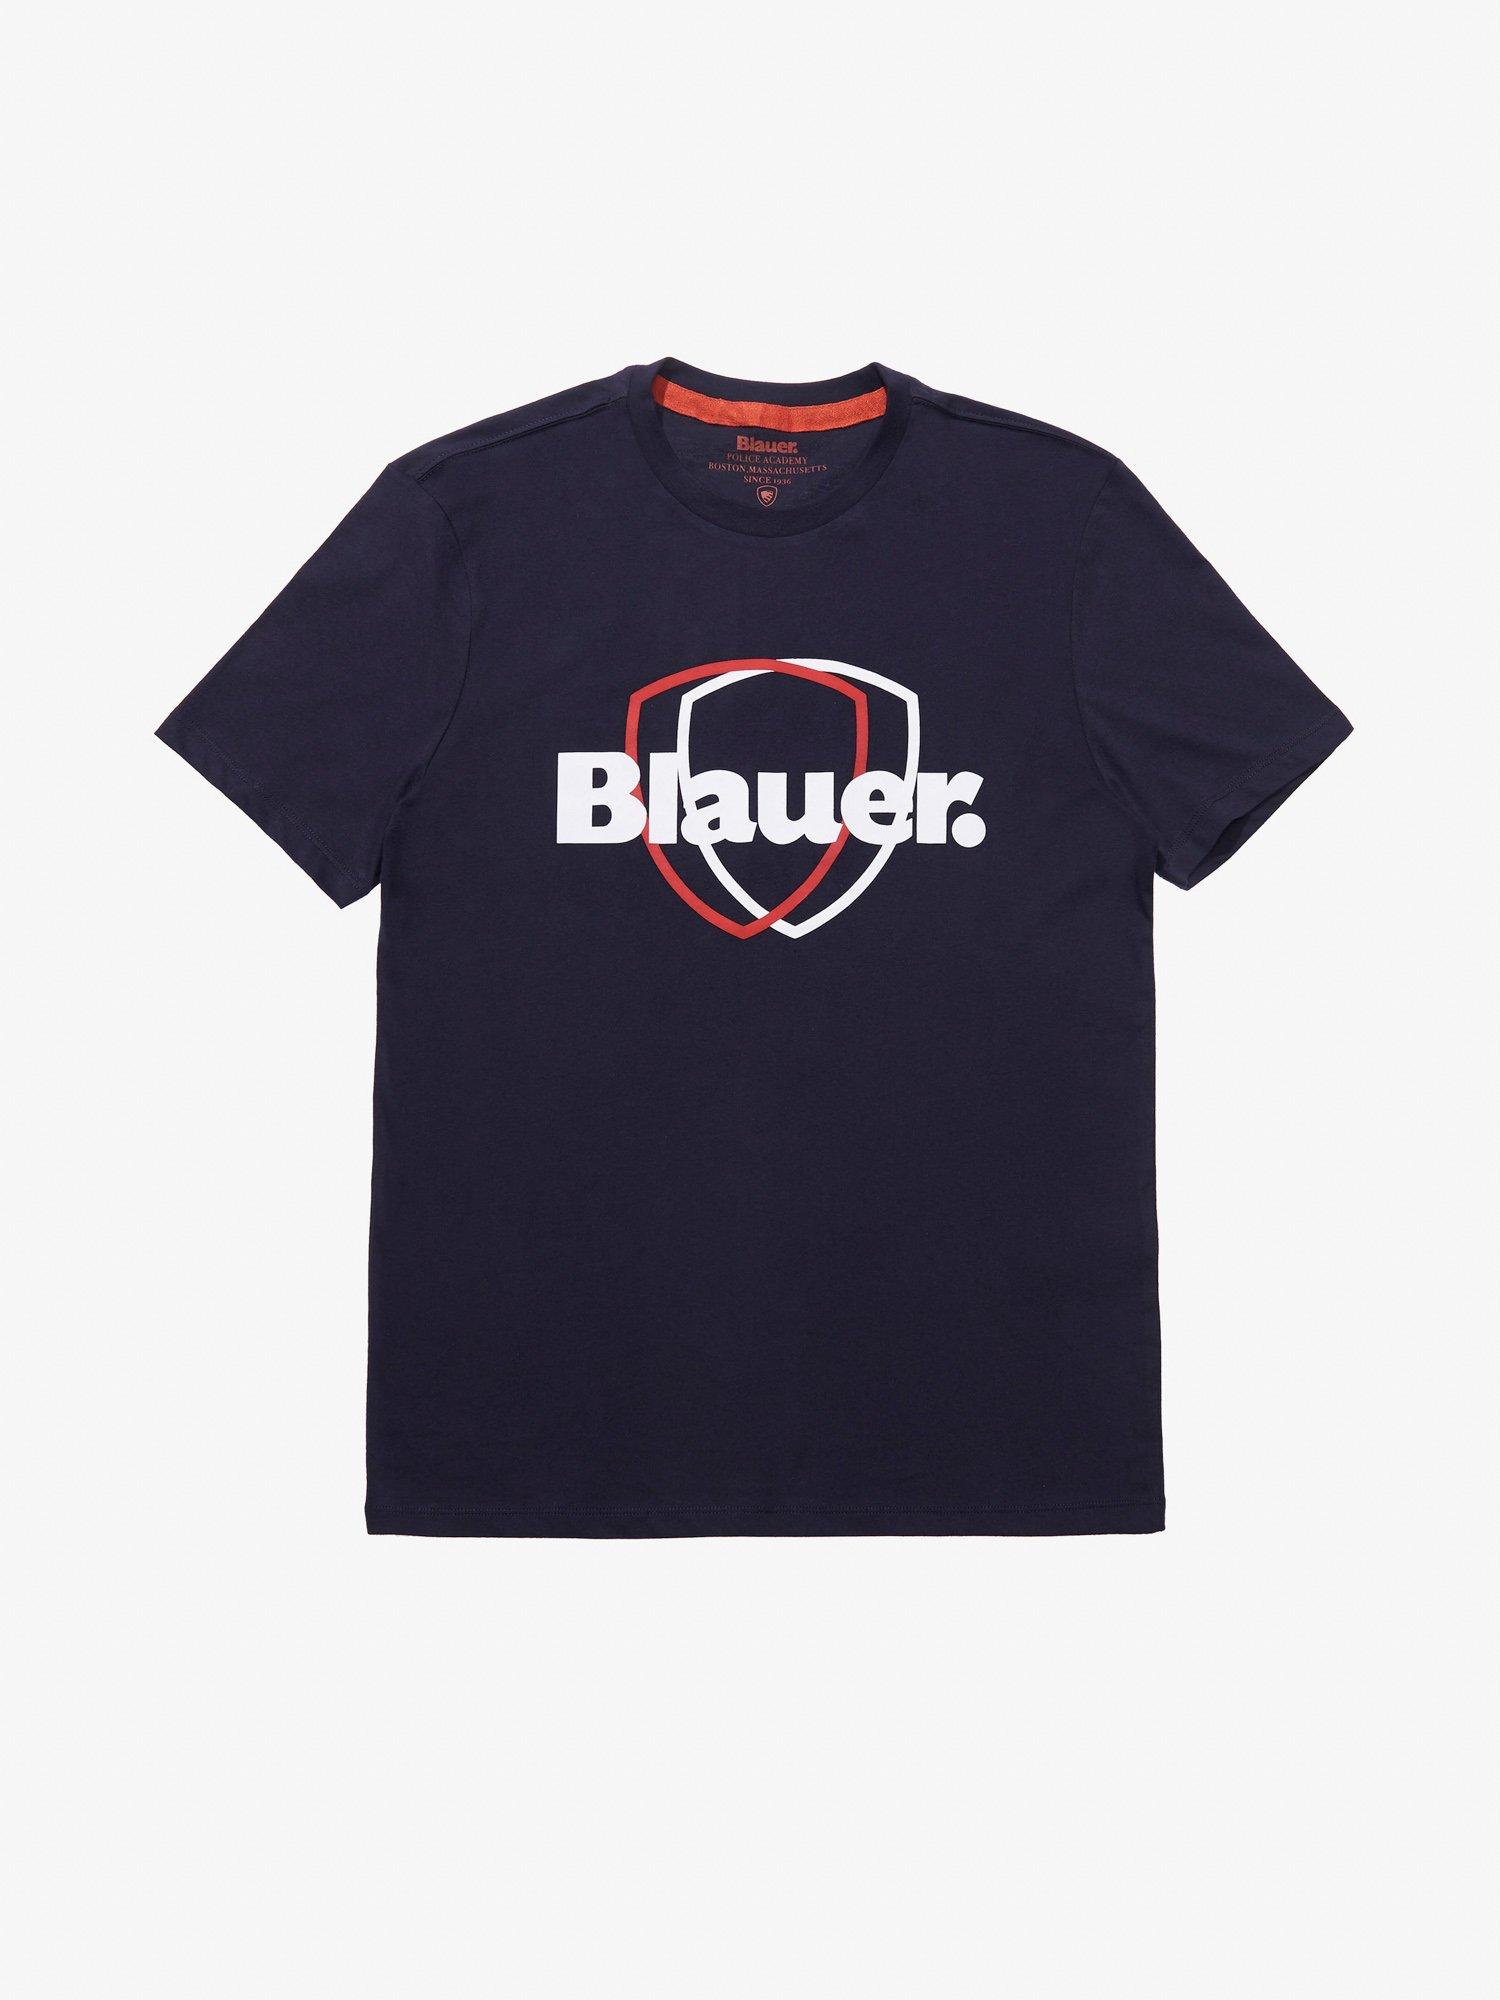 T-SHIRT DOPPIO SCUDO - Blauer